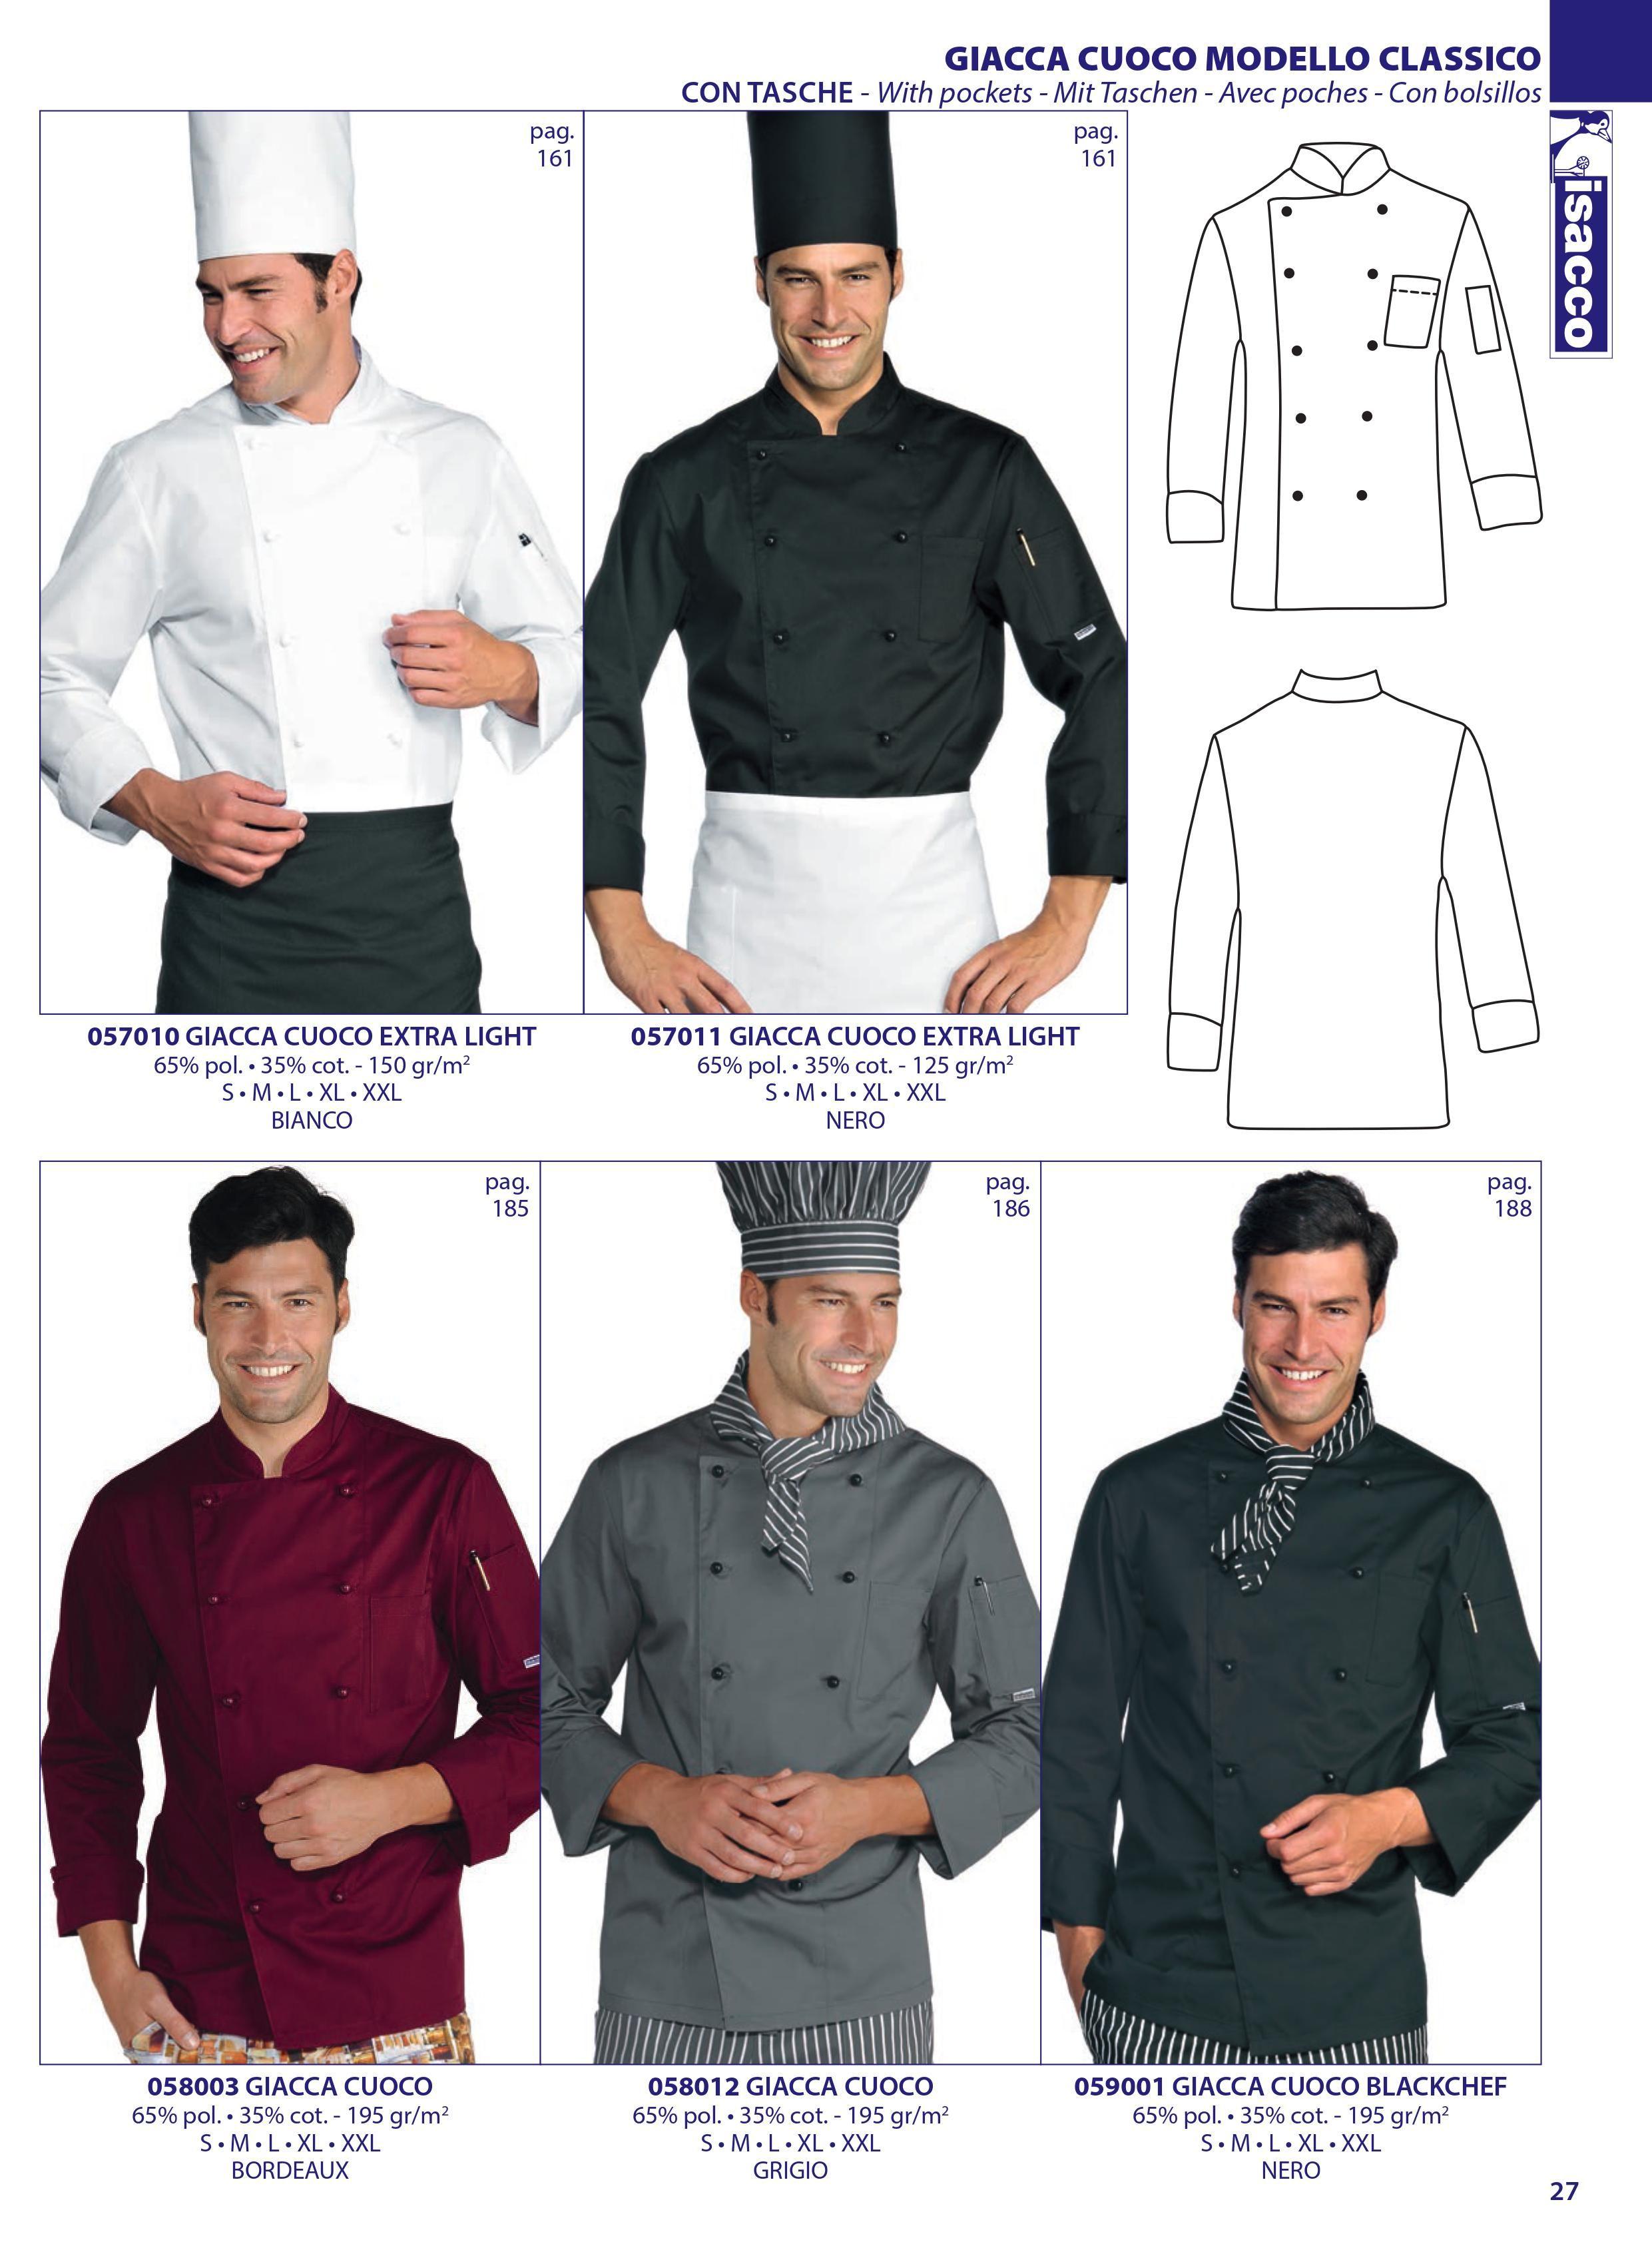 Chaqueta cocina señora y caballero Chef isacco 2016  05e645870dc0